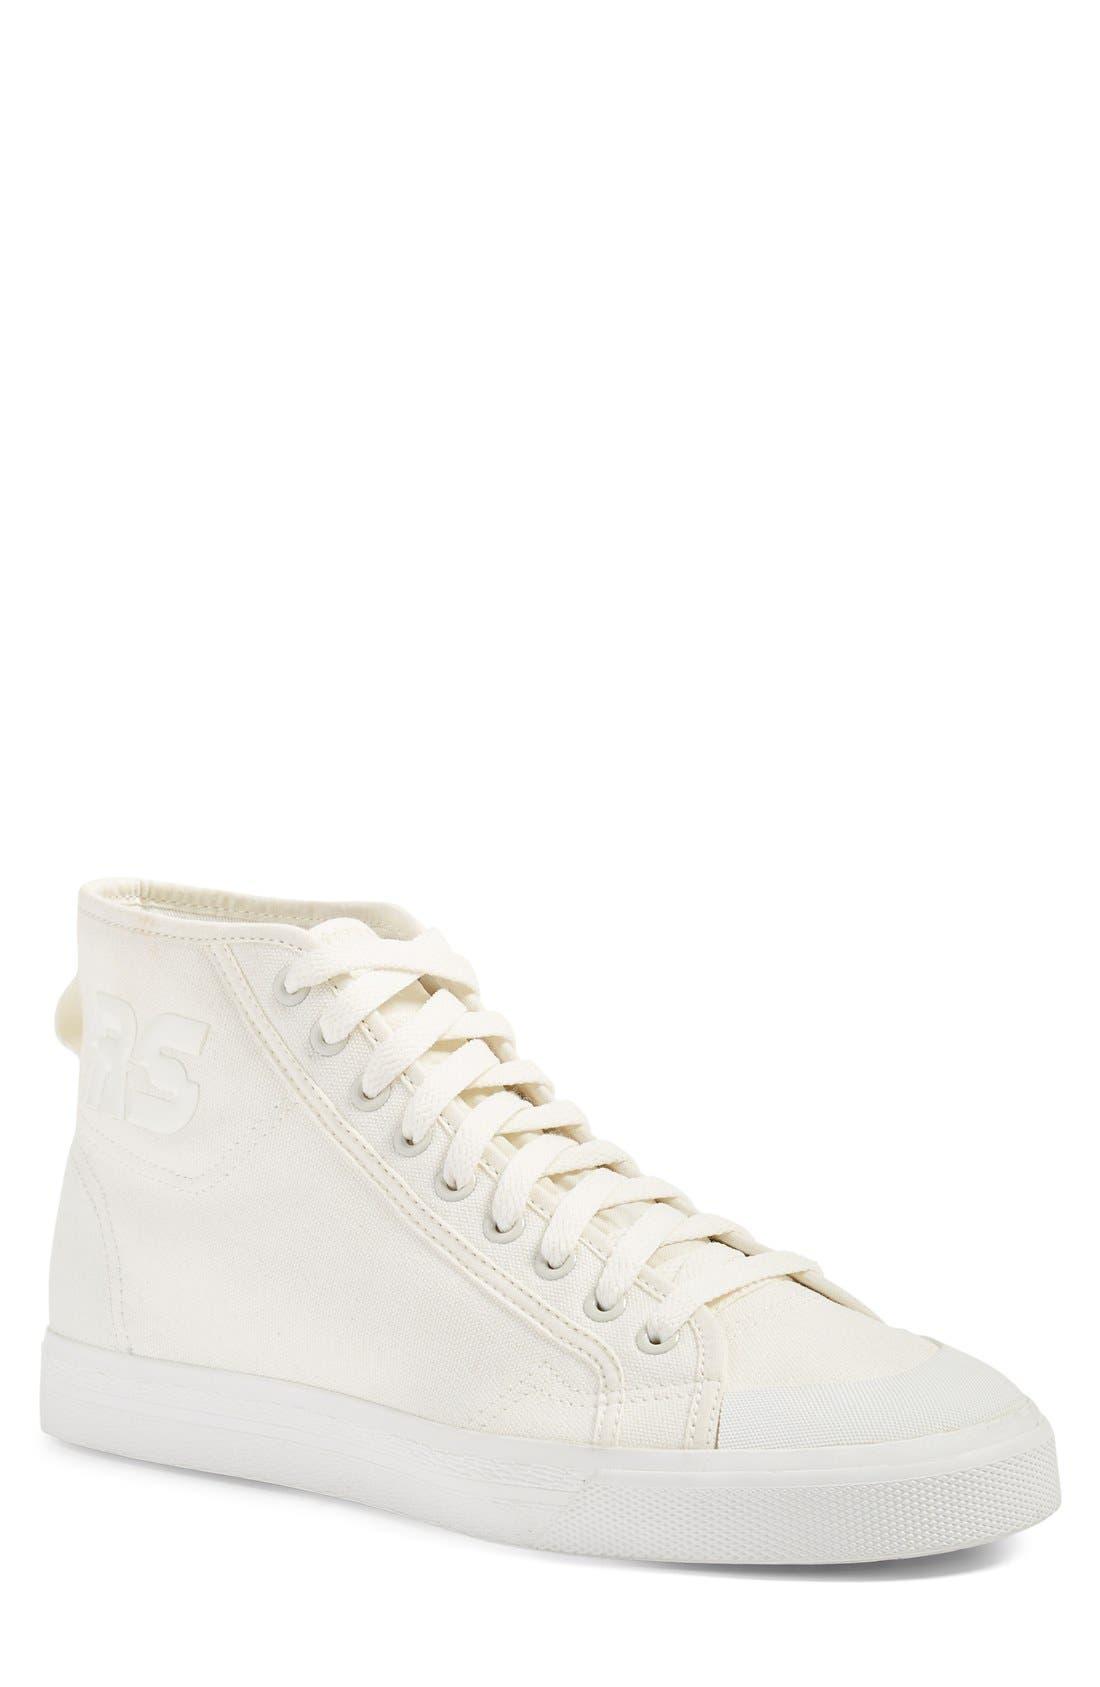 RAF SIMONS adidas by Raf Simons Spirit High Top Sneaker, Main, color, 100